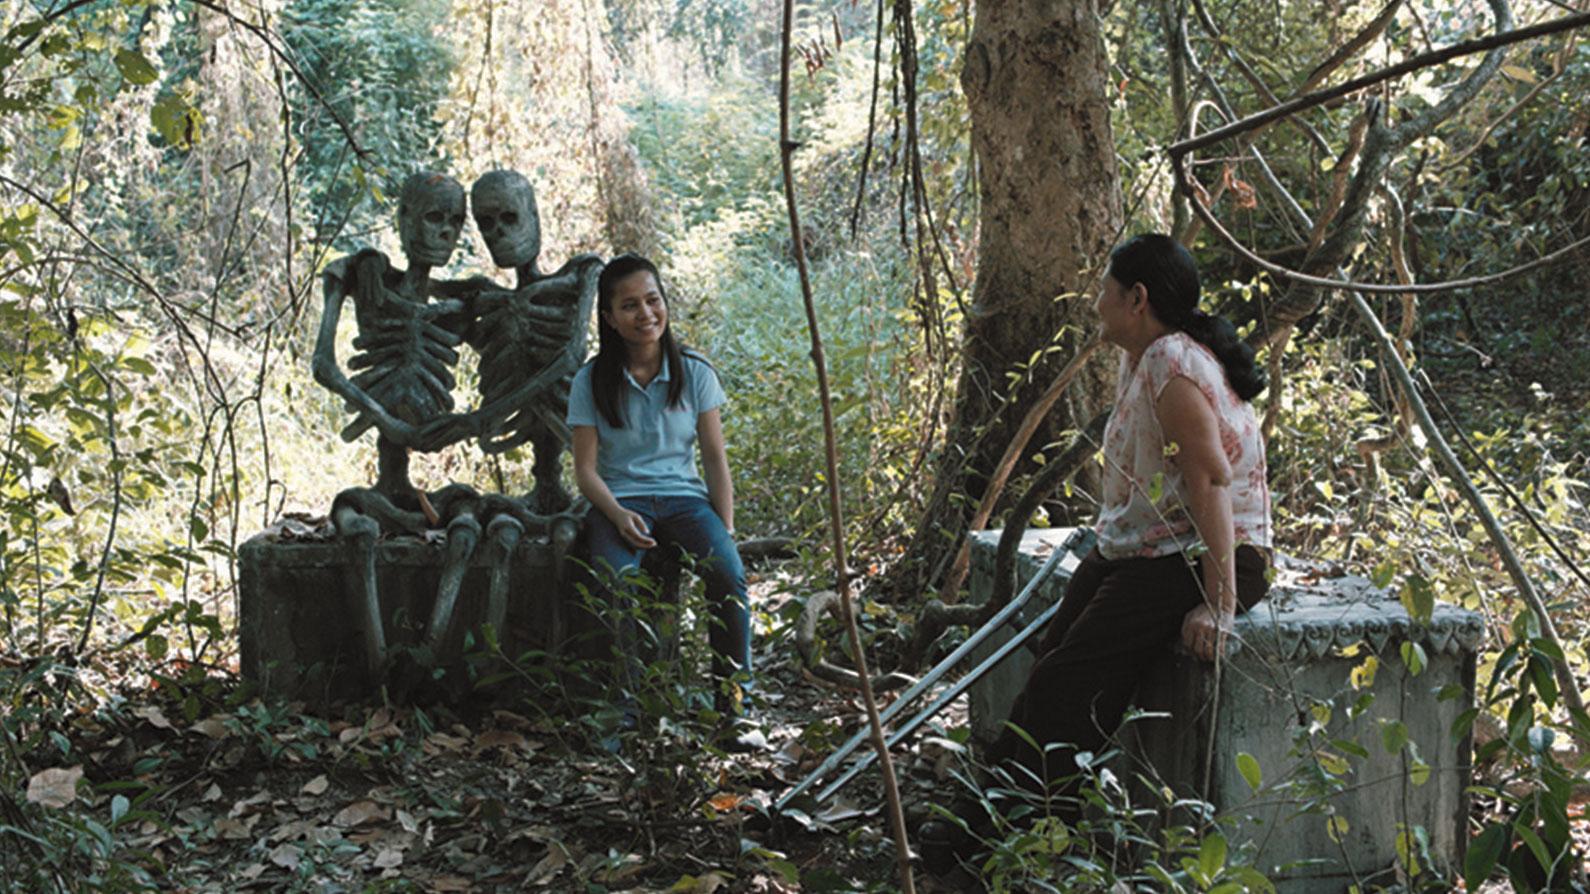 Jarinpattra Rueangram as Keng and Jenjira Pongpas as Jen in Apichatpong Weerasethakul's Cemetery of Splendor, 2015